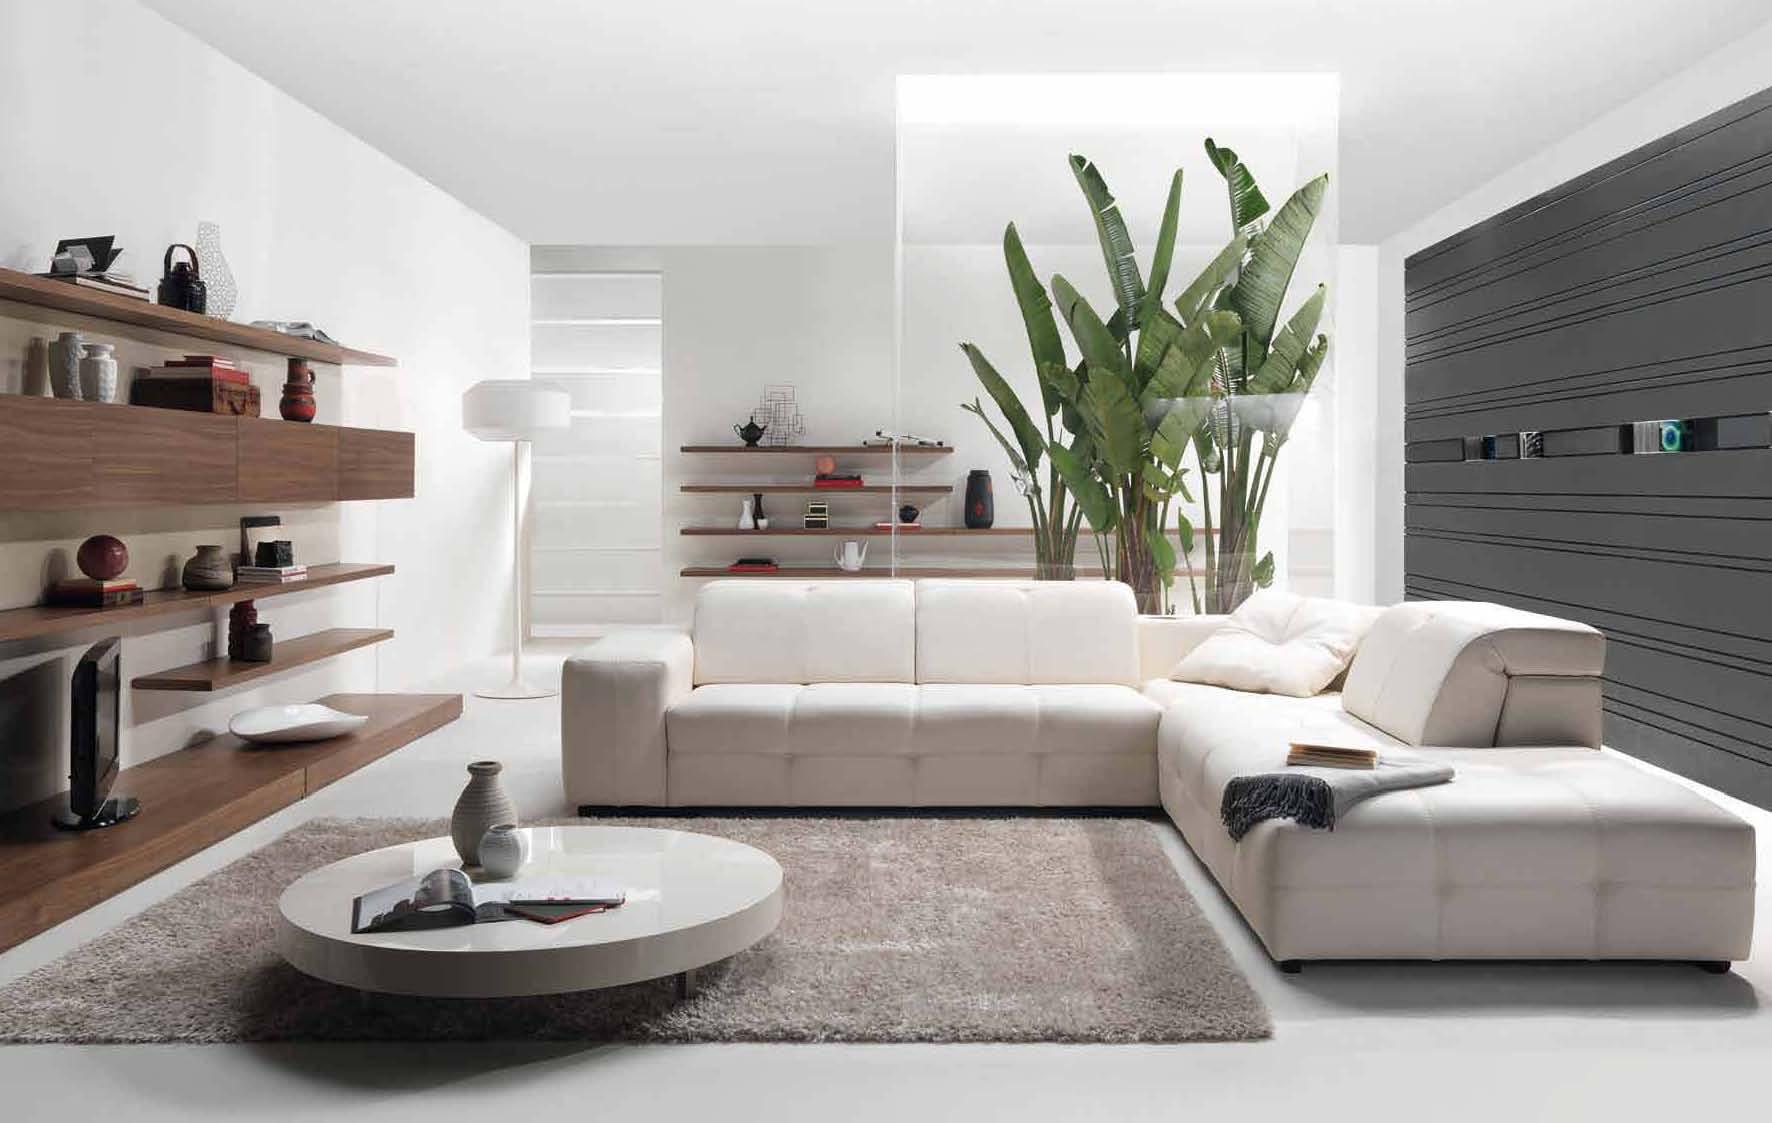 Коричнево-белый интерьер гостиной в стиле модерн